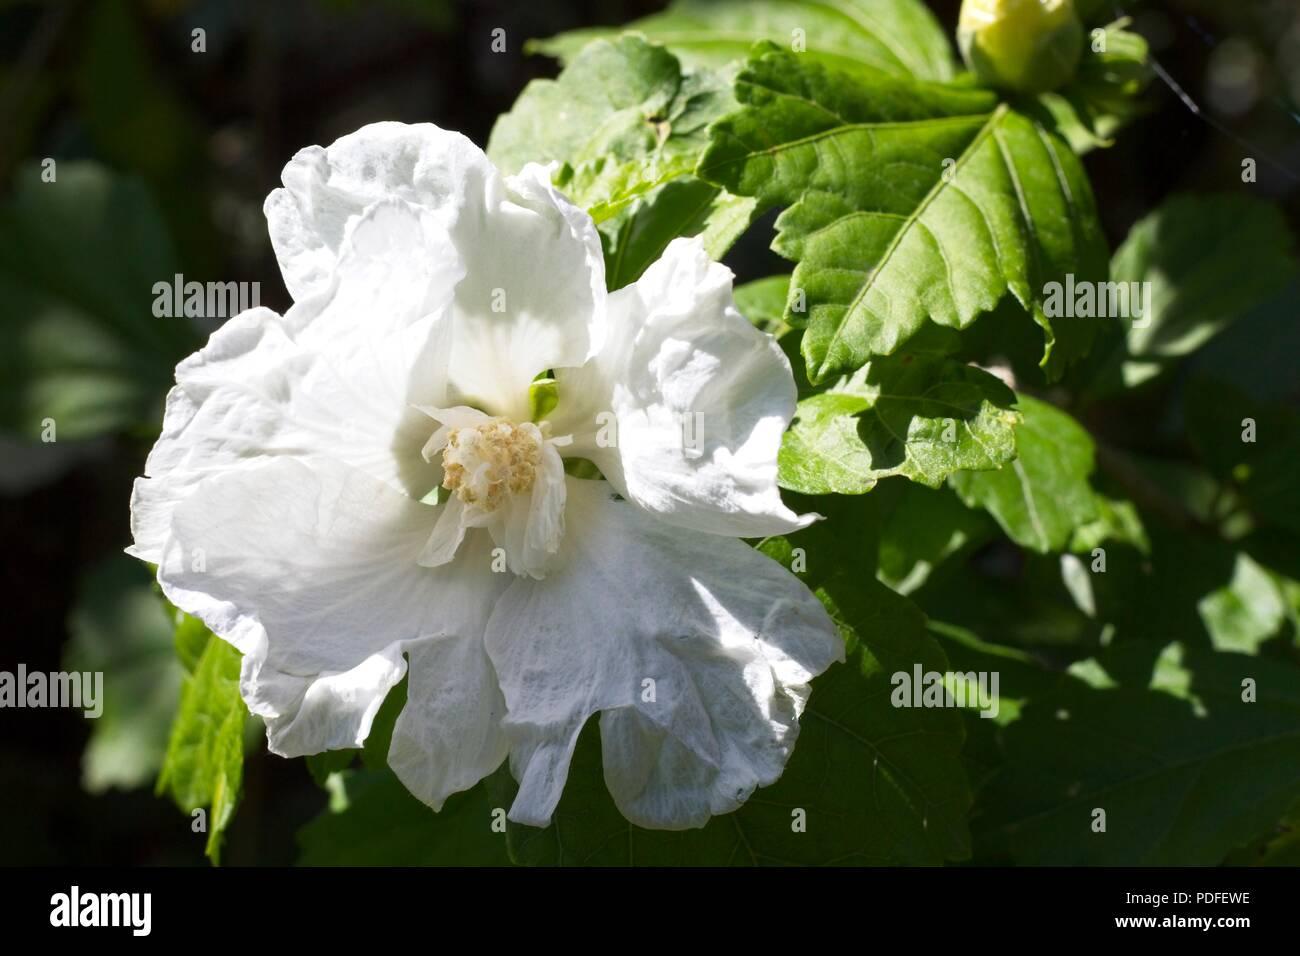 White hibiscus flowers Stock Photo: 214855914 - Alamy